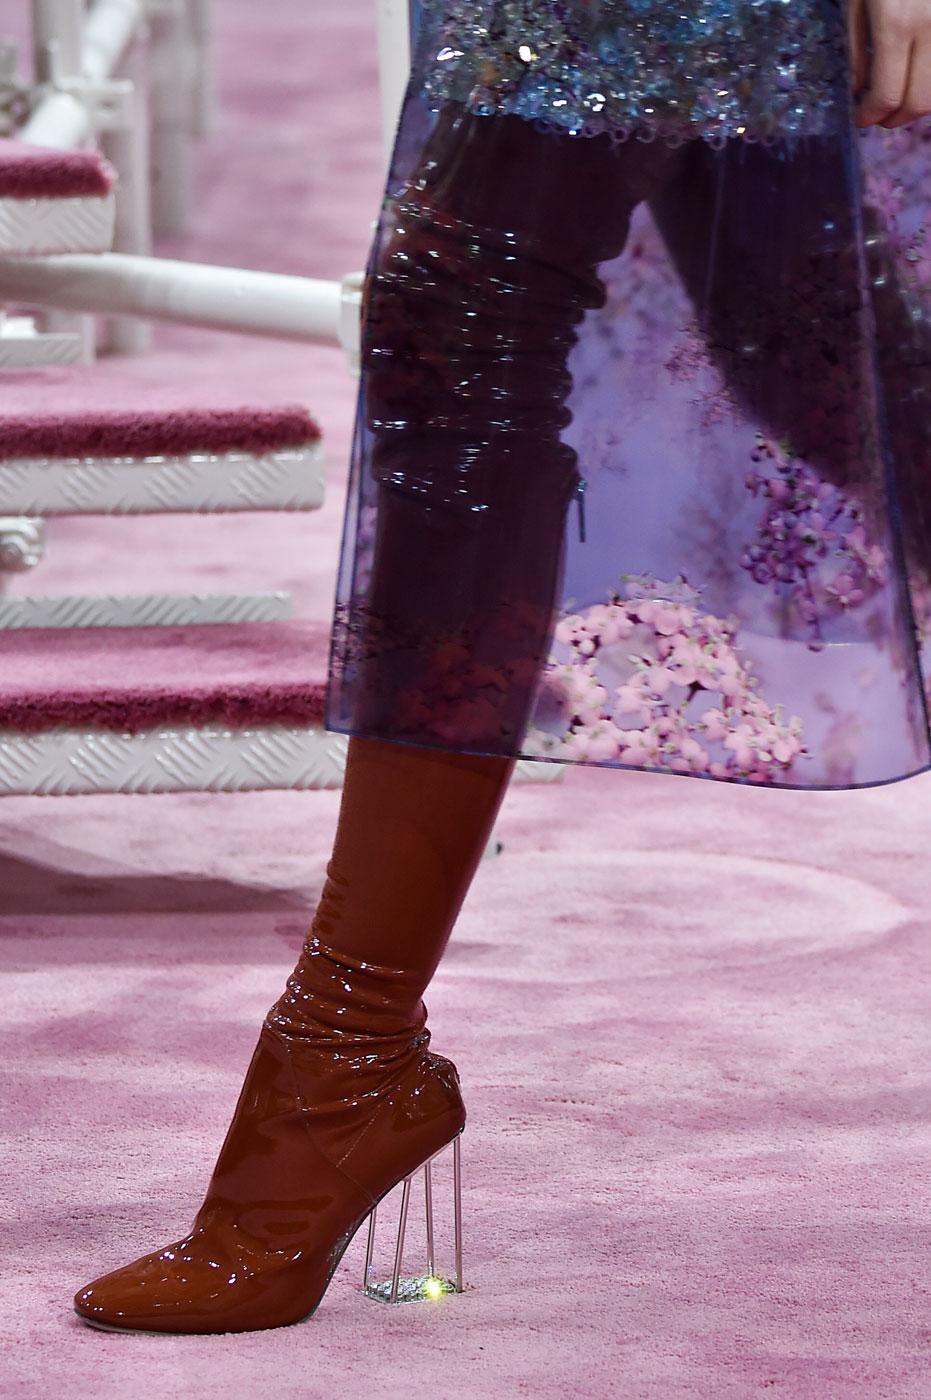 Christian-Dior-fashion-runway-show-close-ups-haute-couture-paris-spring-summer-2015-the-impression-166